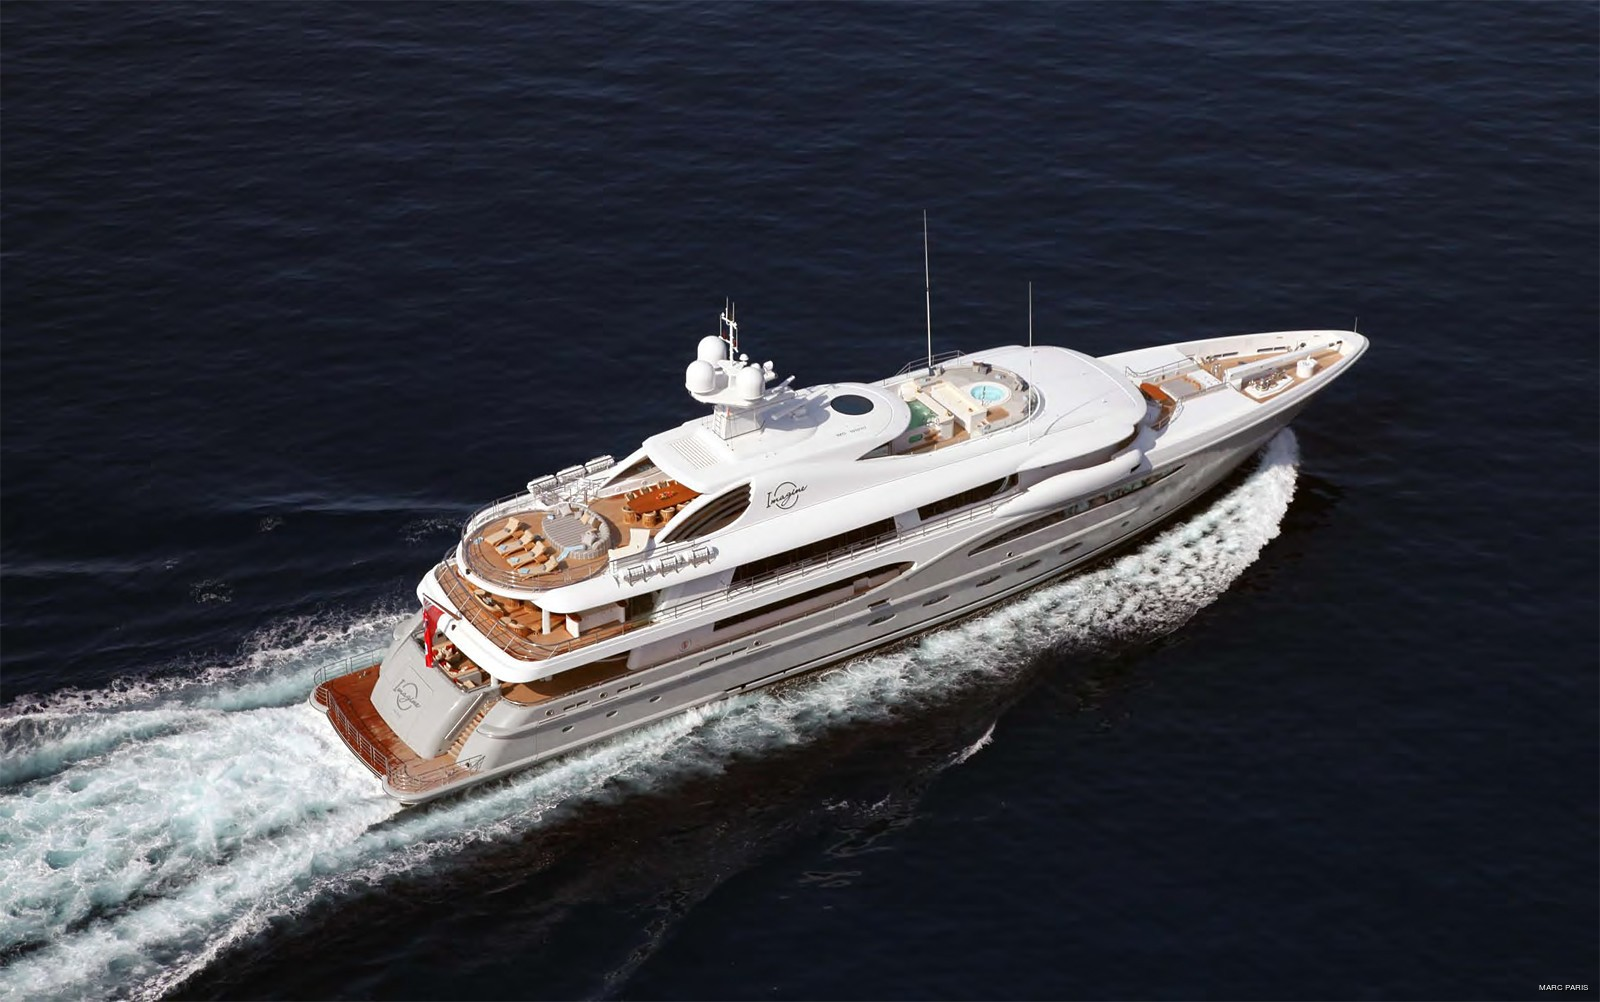 From Above: Yacht INFINITE SHADES's Cruising Image